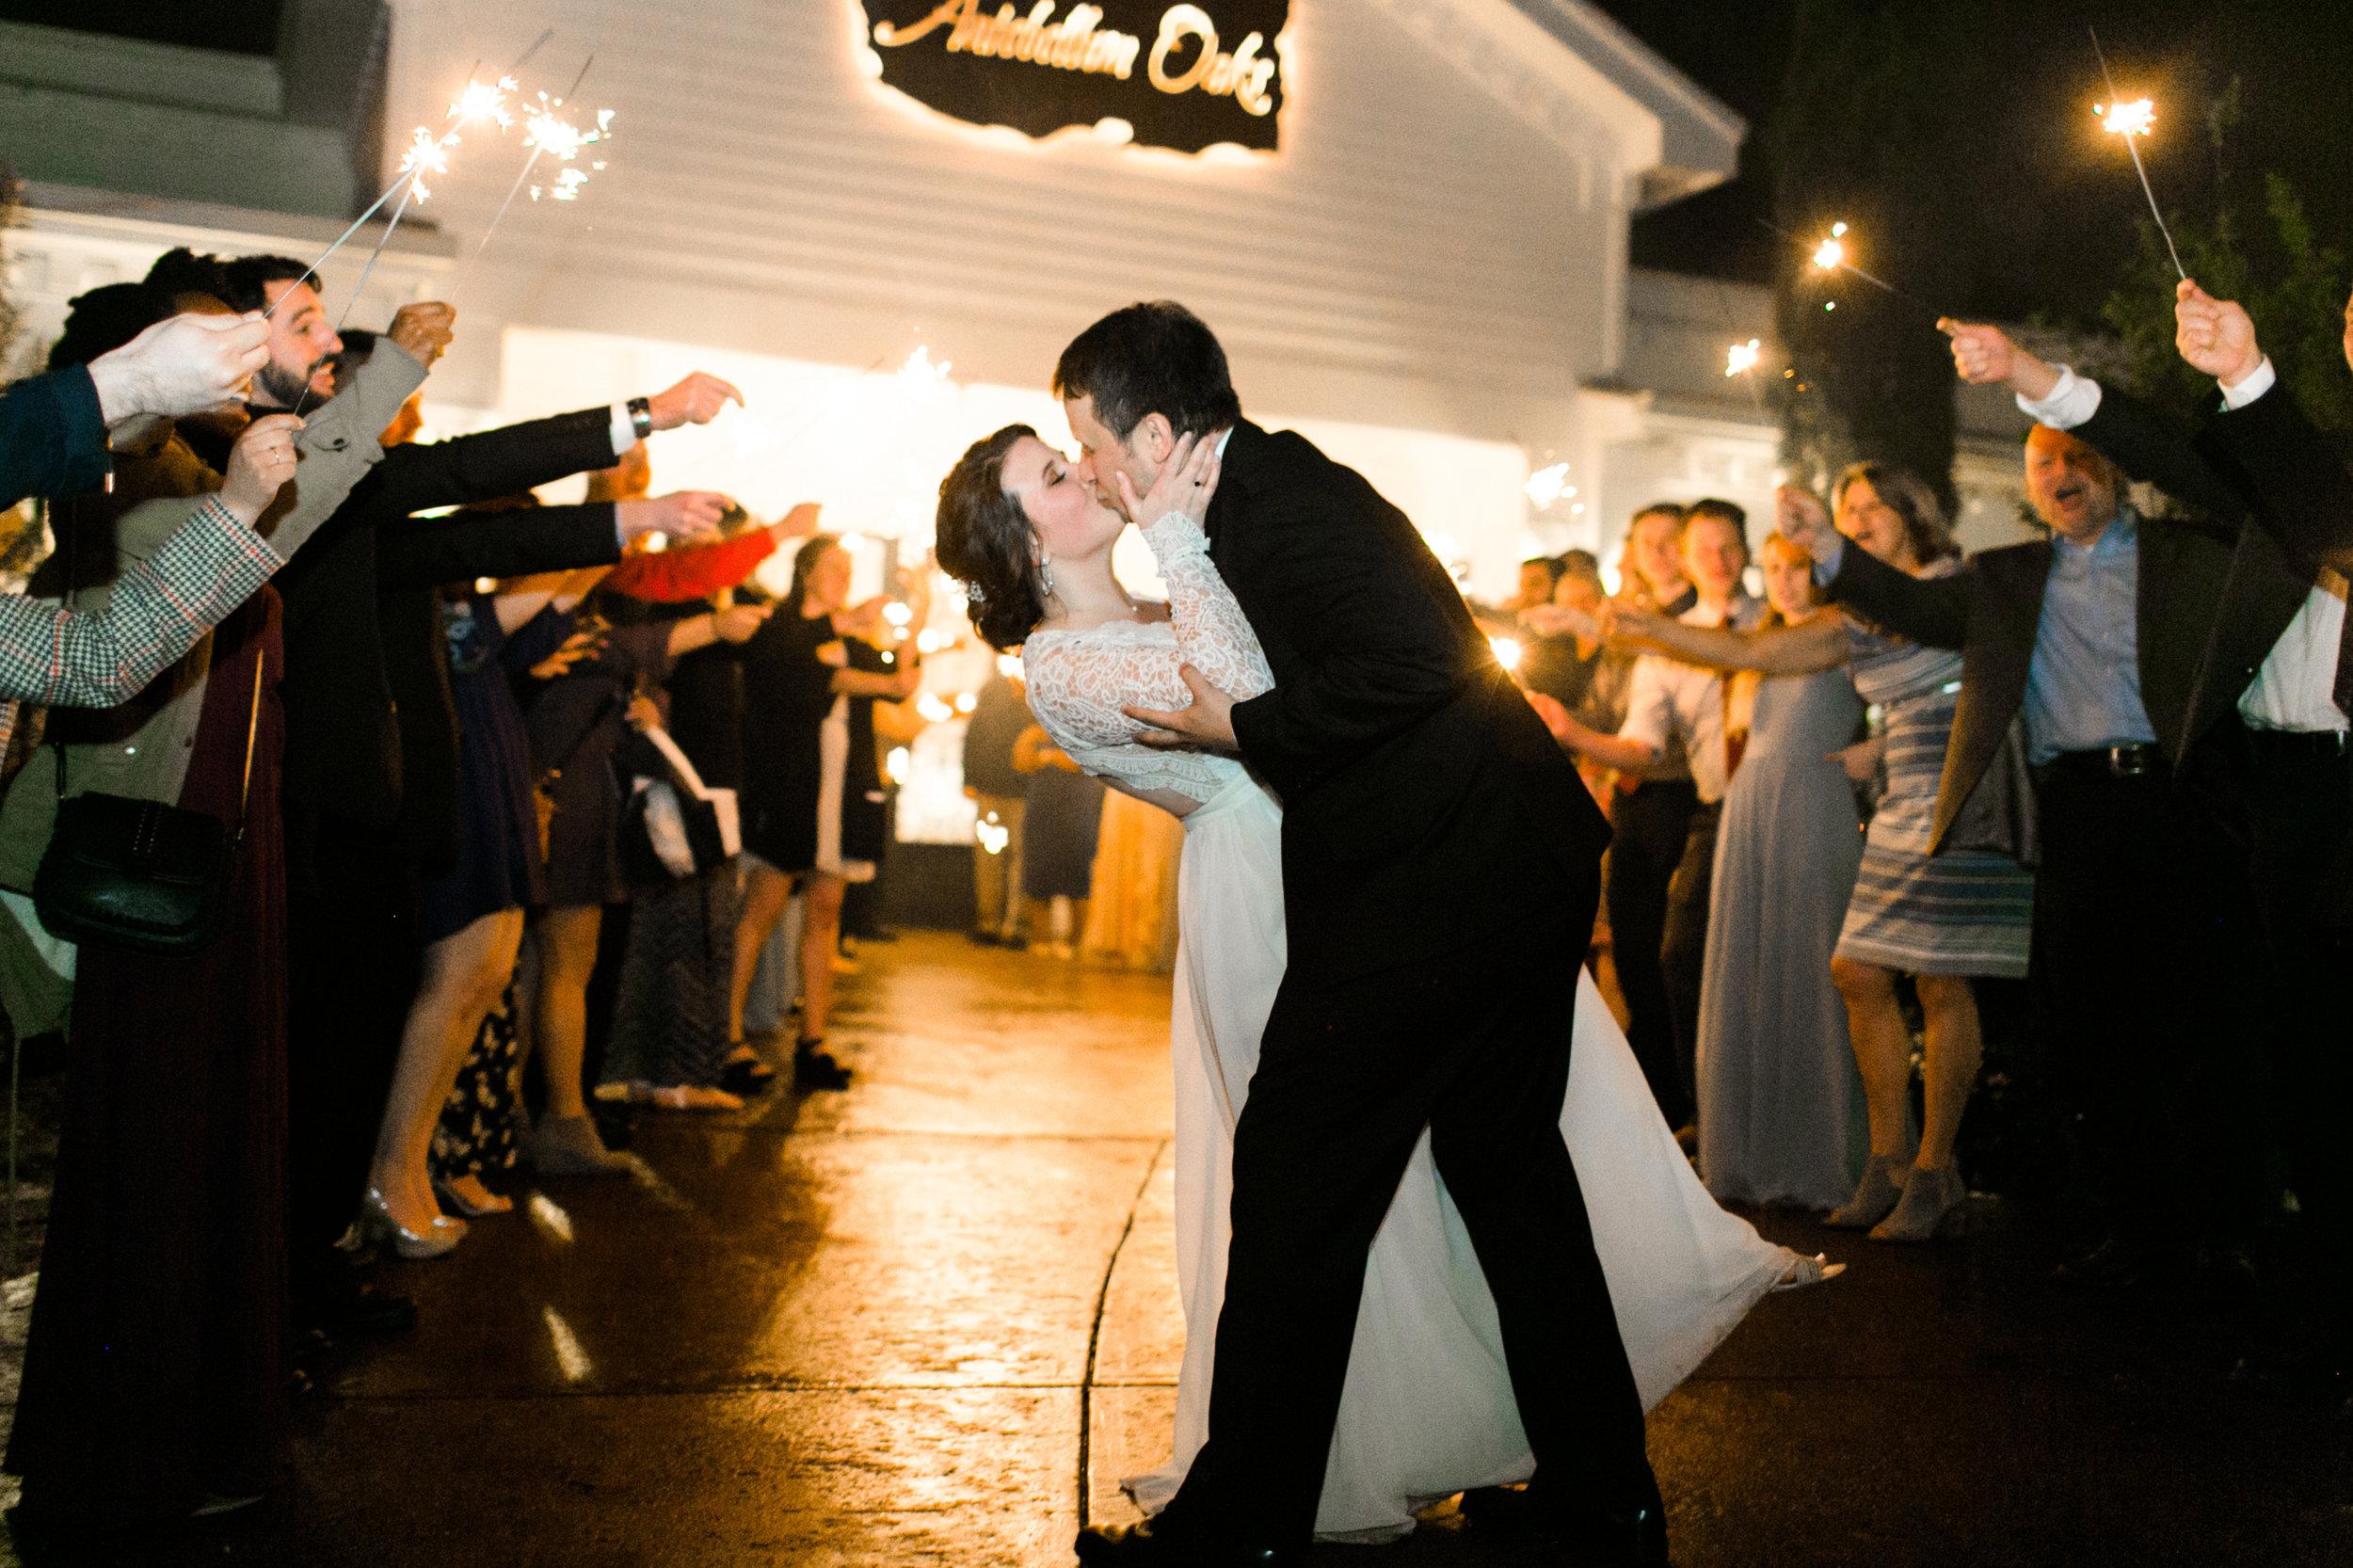 Austin_Texas_Fine_Art_Wedding_Photographer_Kayla_Snell_Photography_Antebellum_Oaks811.jpg